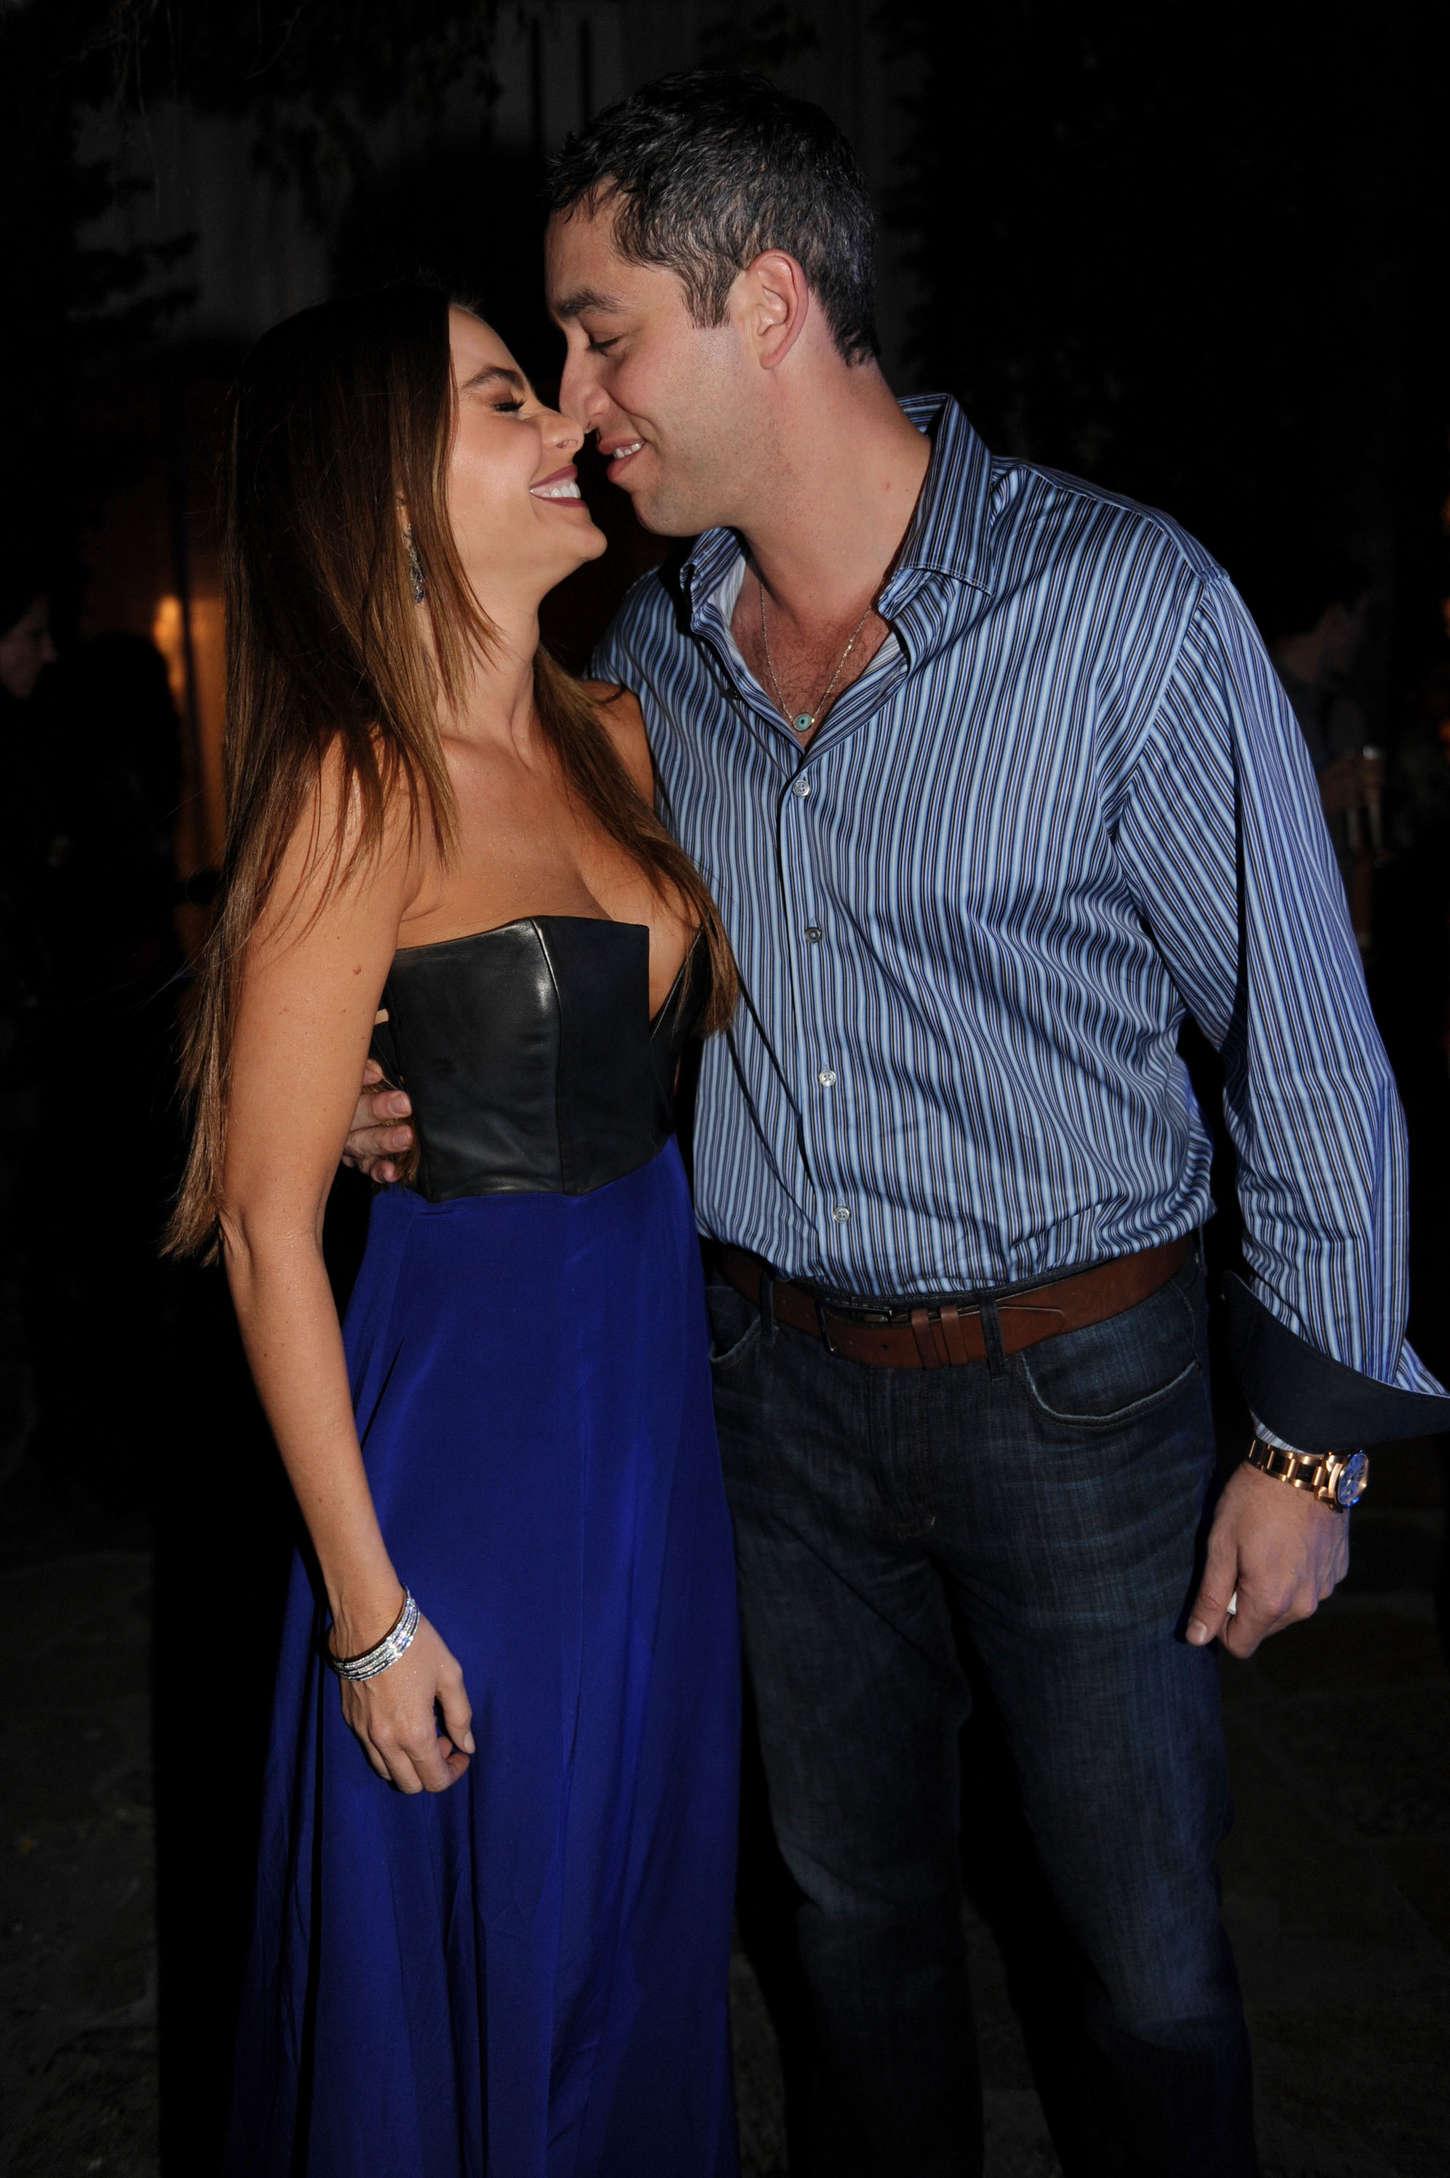 Sofia Vergara dating 2013dating en gutt som har en kjæreste